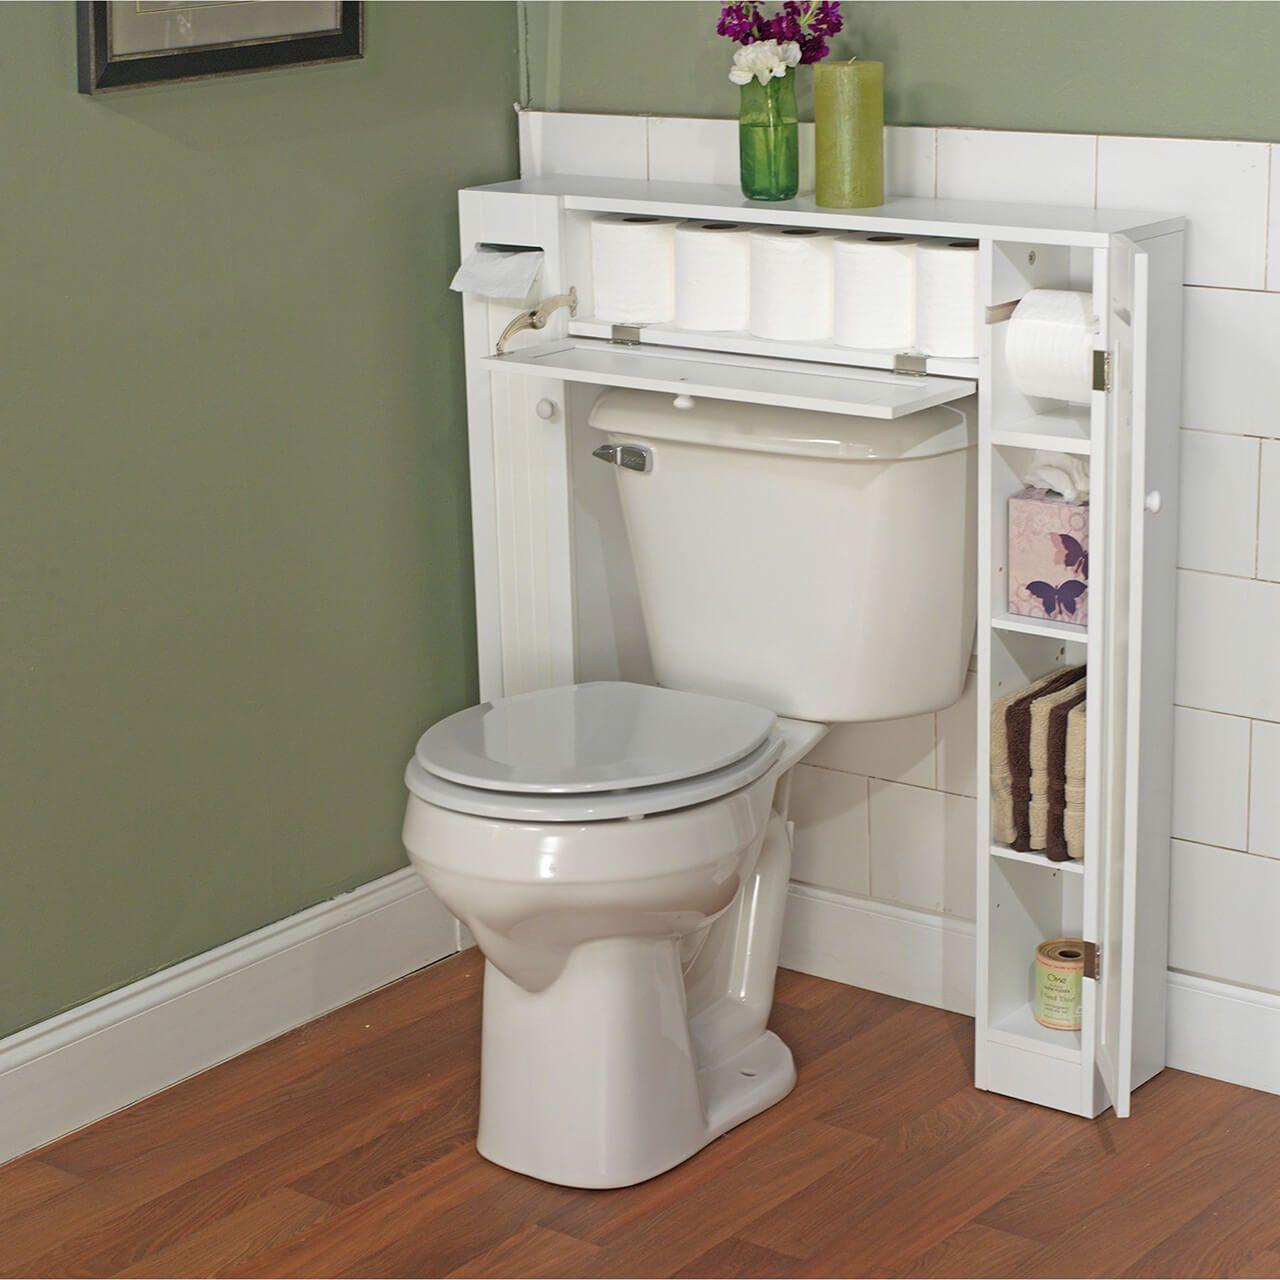 Bathroom Idea 742038544792891674 Small Bathroom Storage Bathroom Storage Small Bathroom